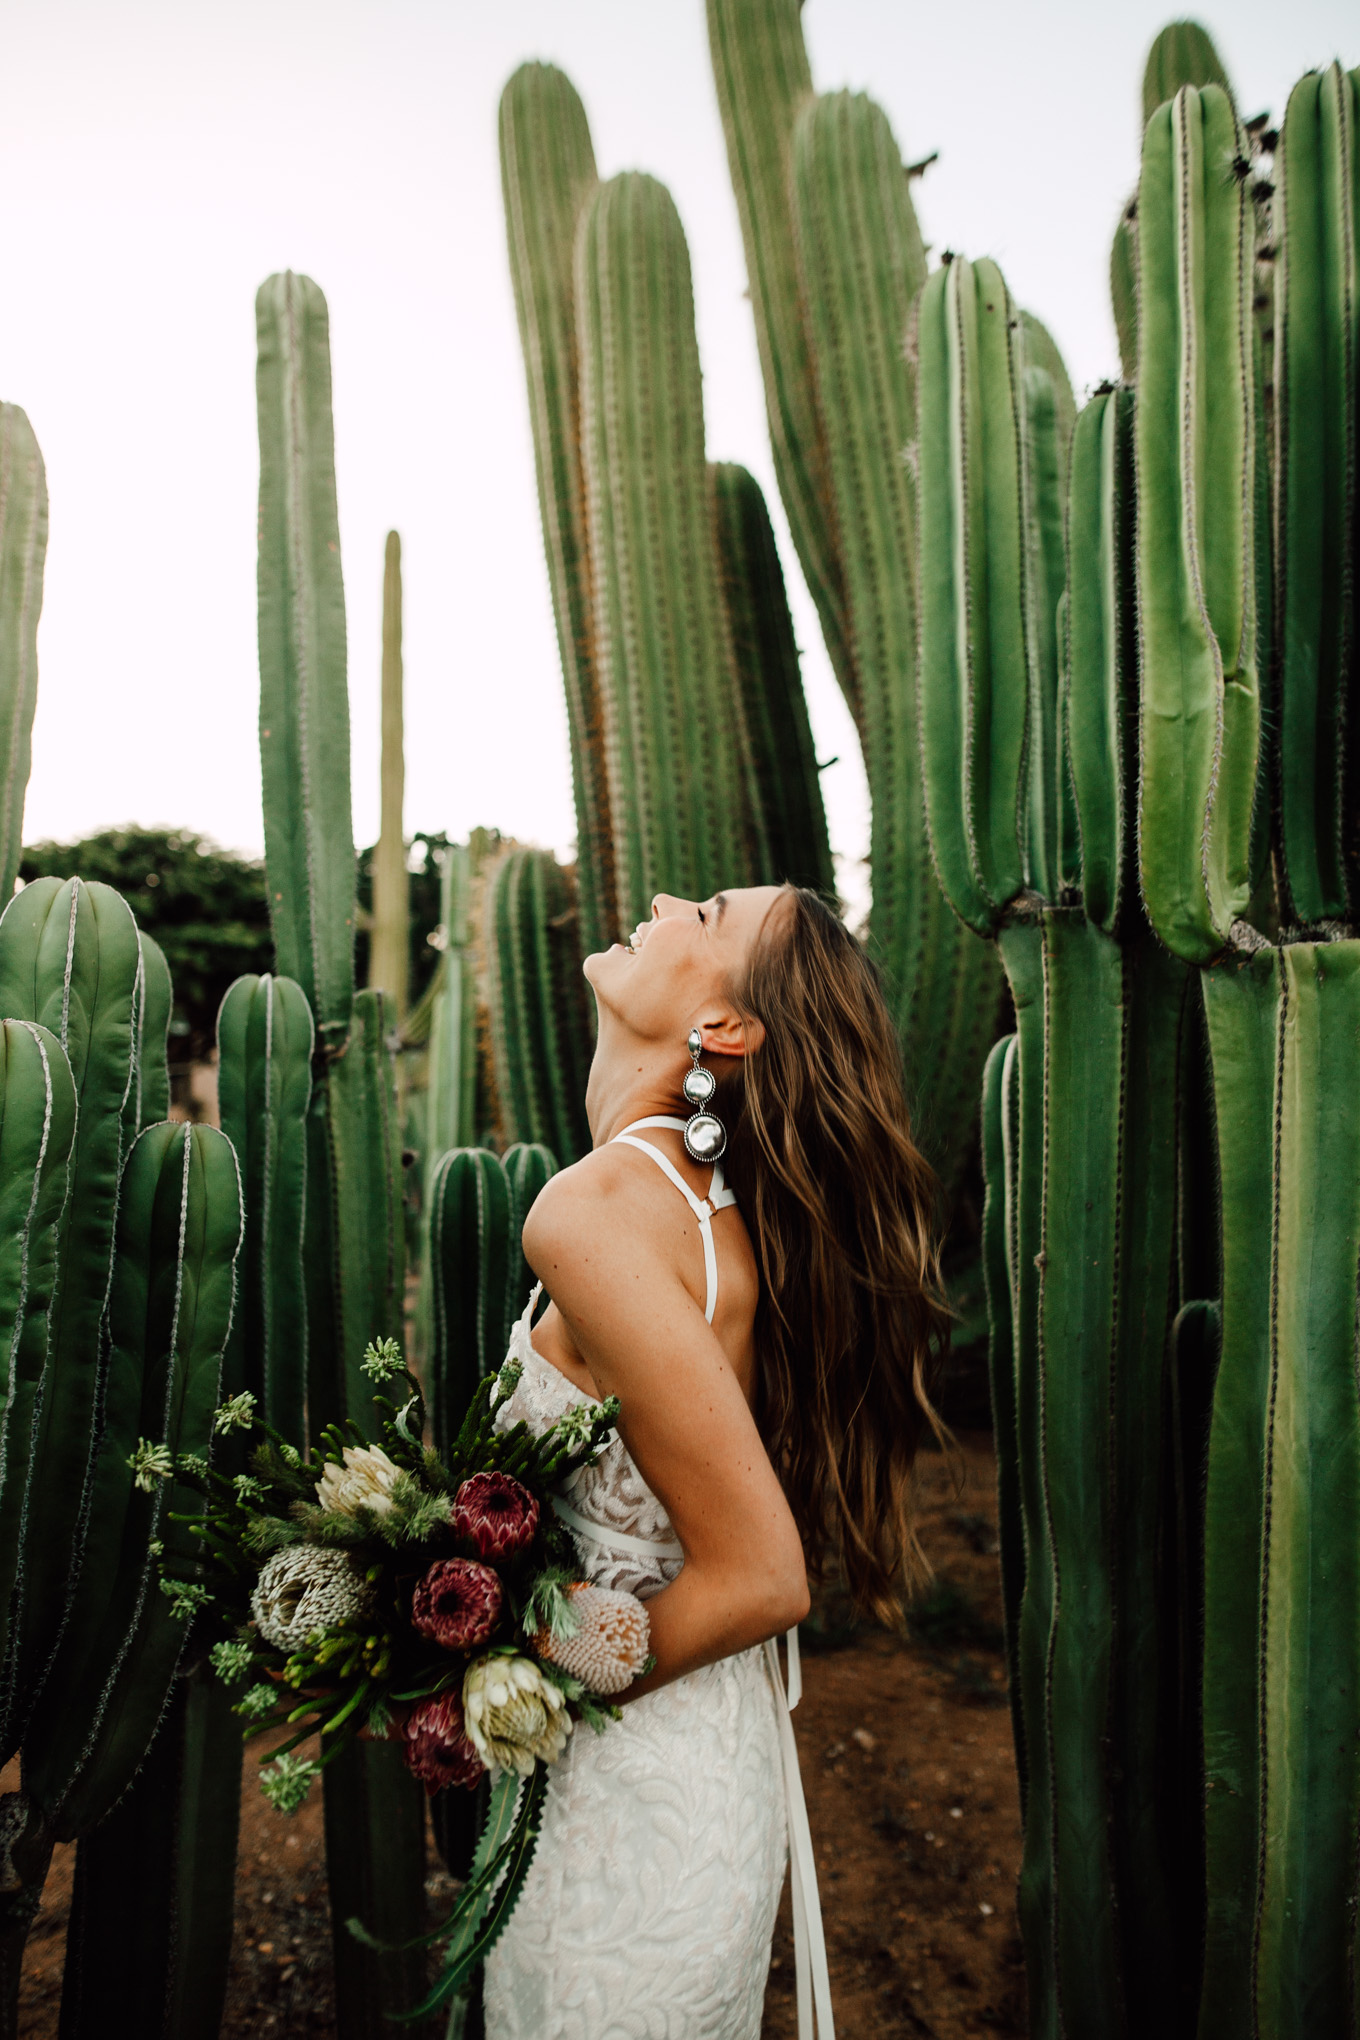 Cape-Town-Pia-Anna-Christian-Wedding-Photography-South-Africa-Bride-Cactus-16.jpg